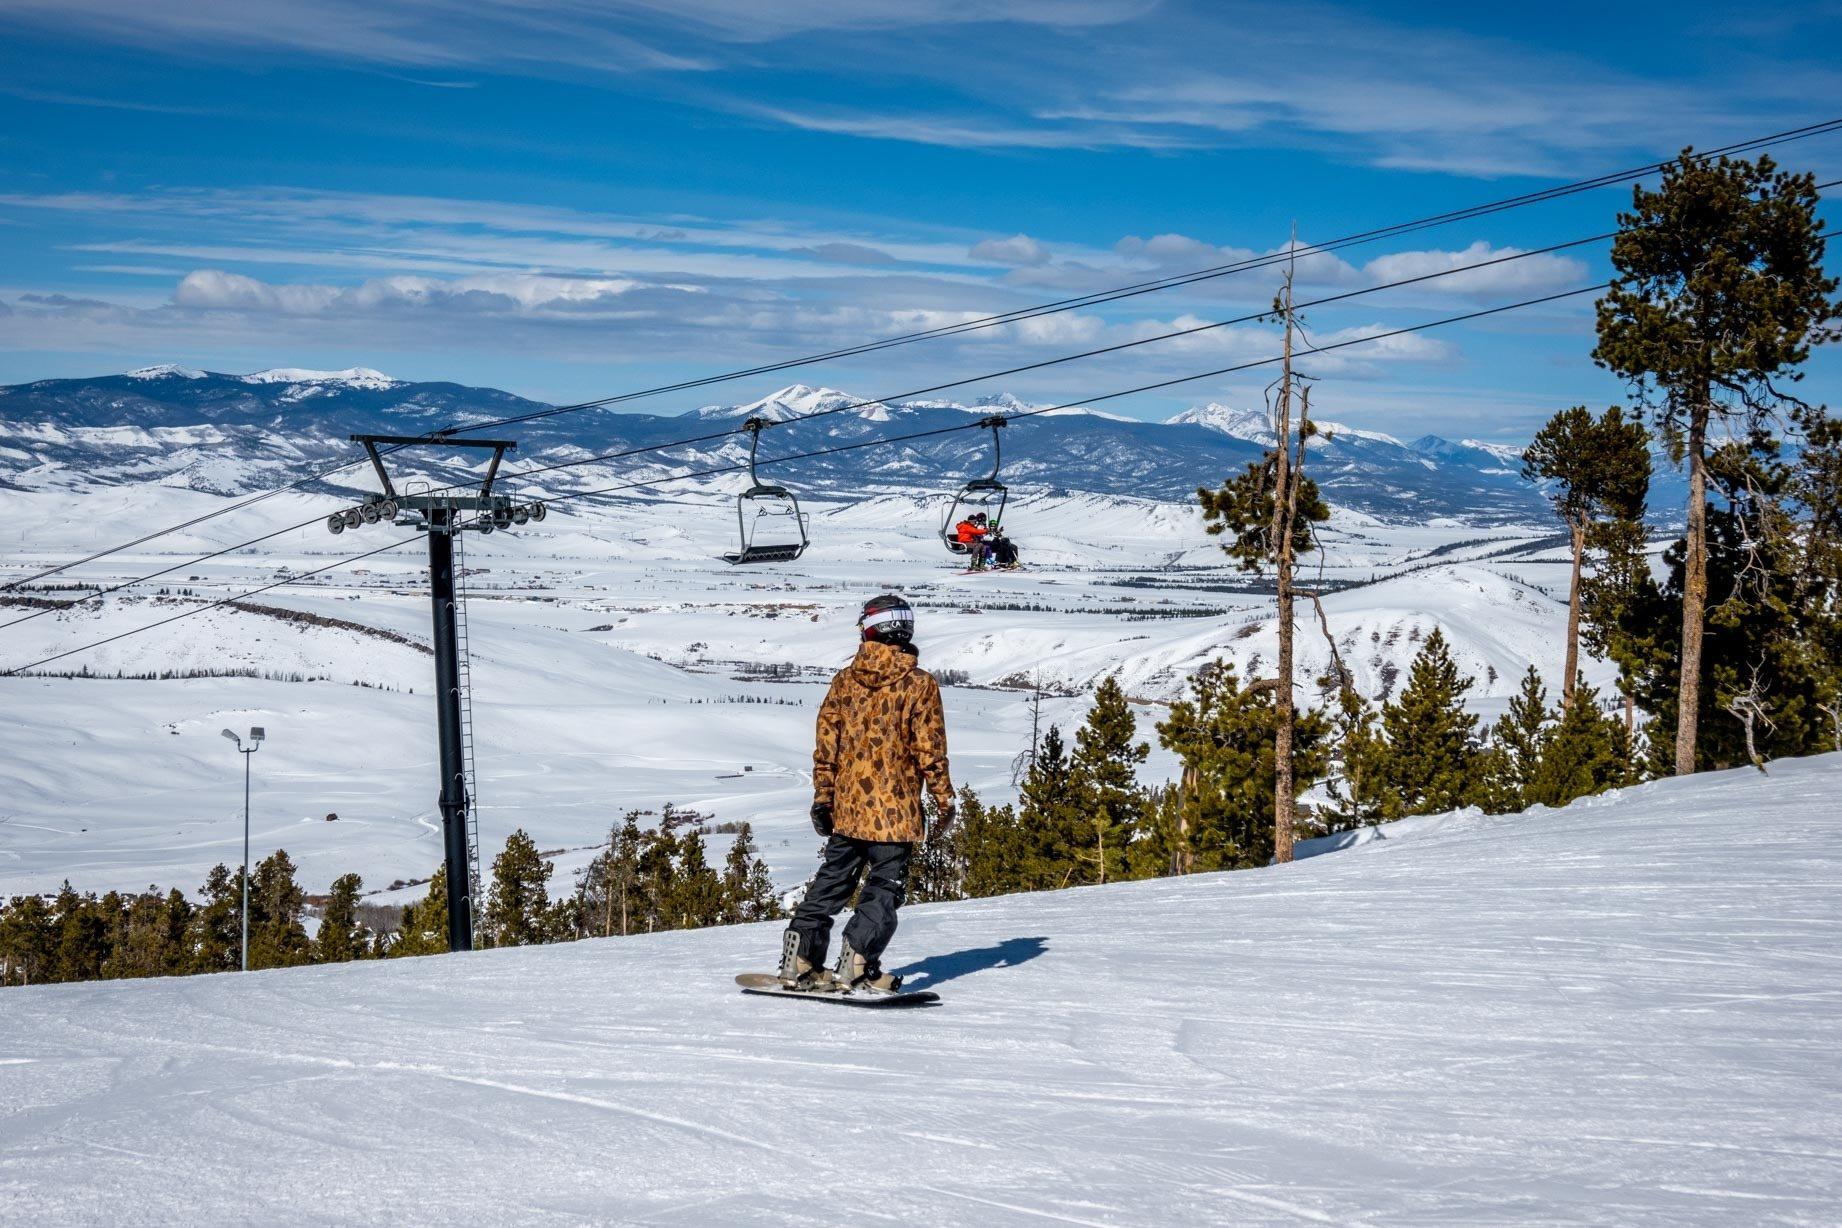 Snowboarder on a mountain near a ski lift